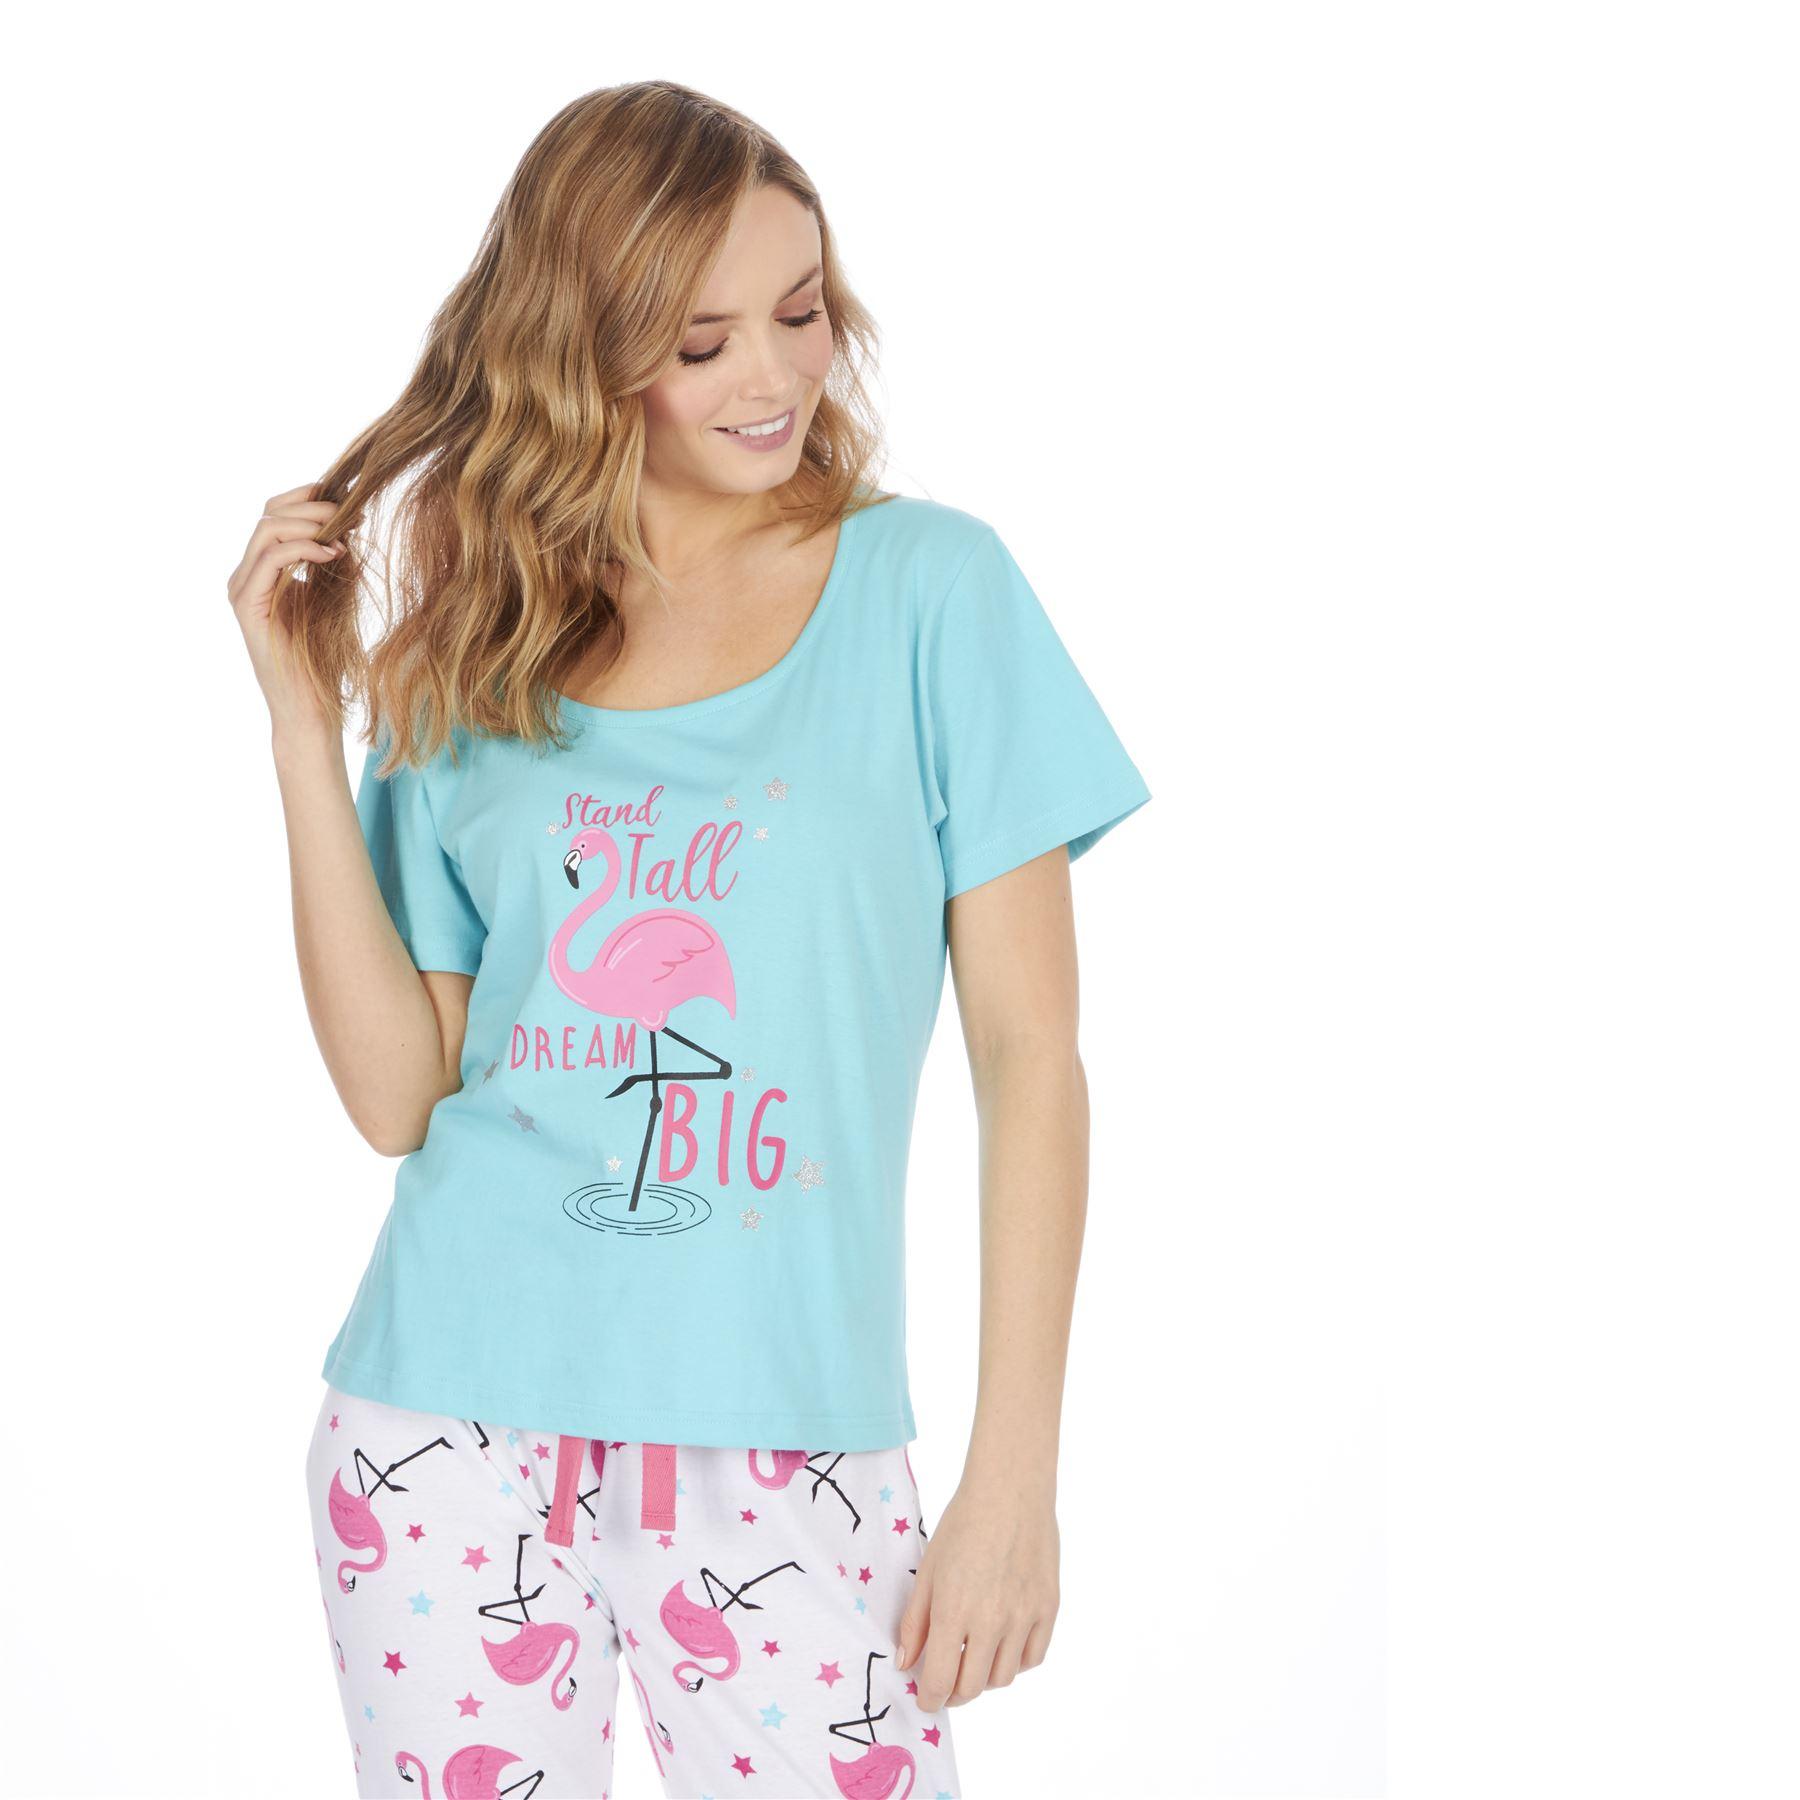 Womens-Ladies-Cotton-Pyjamas-Pyjama-PJs-Summer-Nightwear-Set-Size-8-18-NEW thumbnail 3